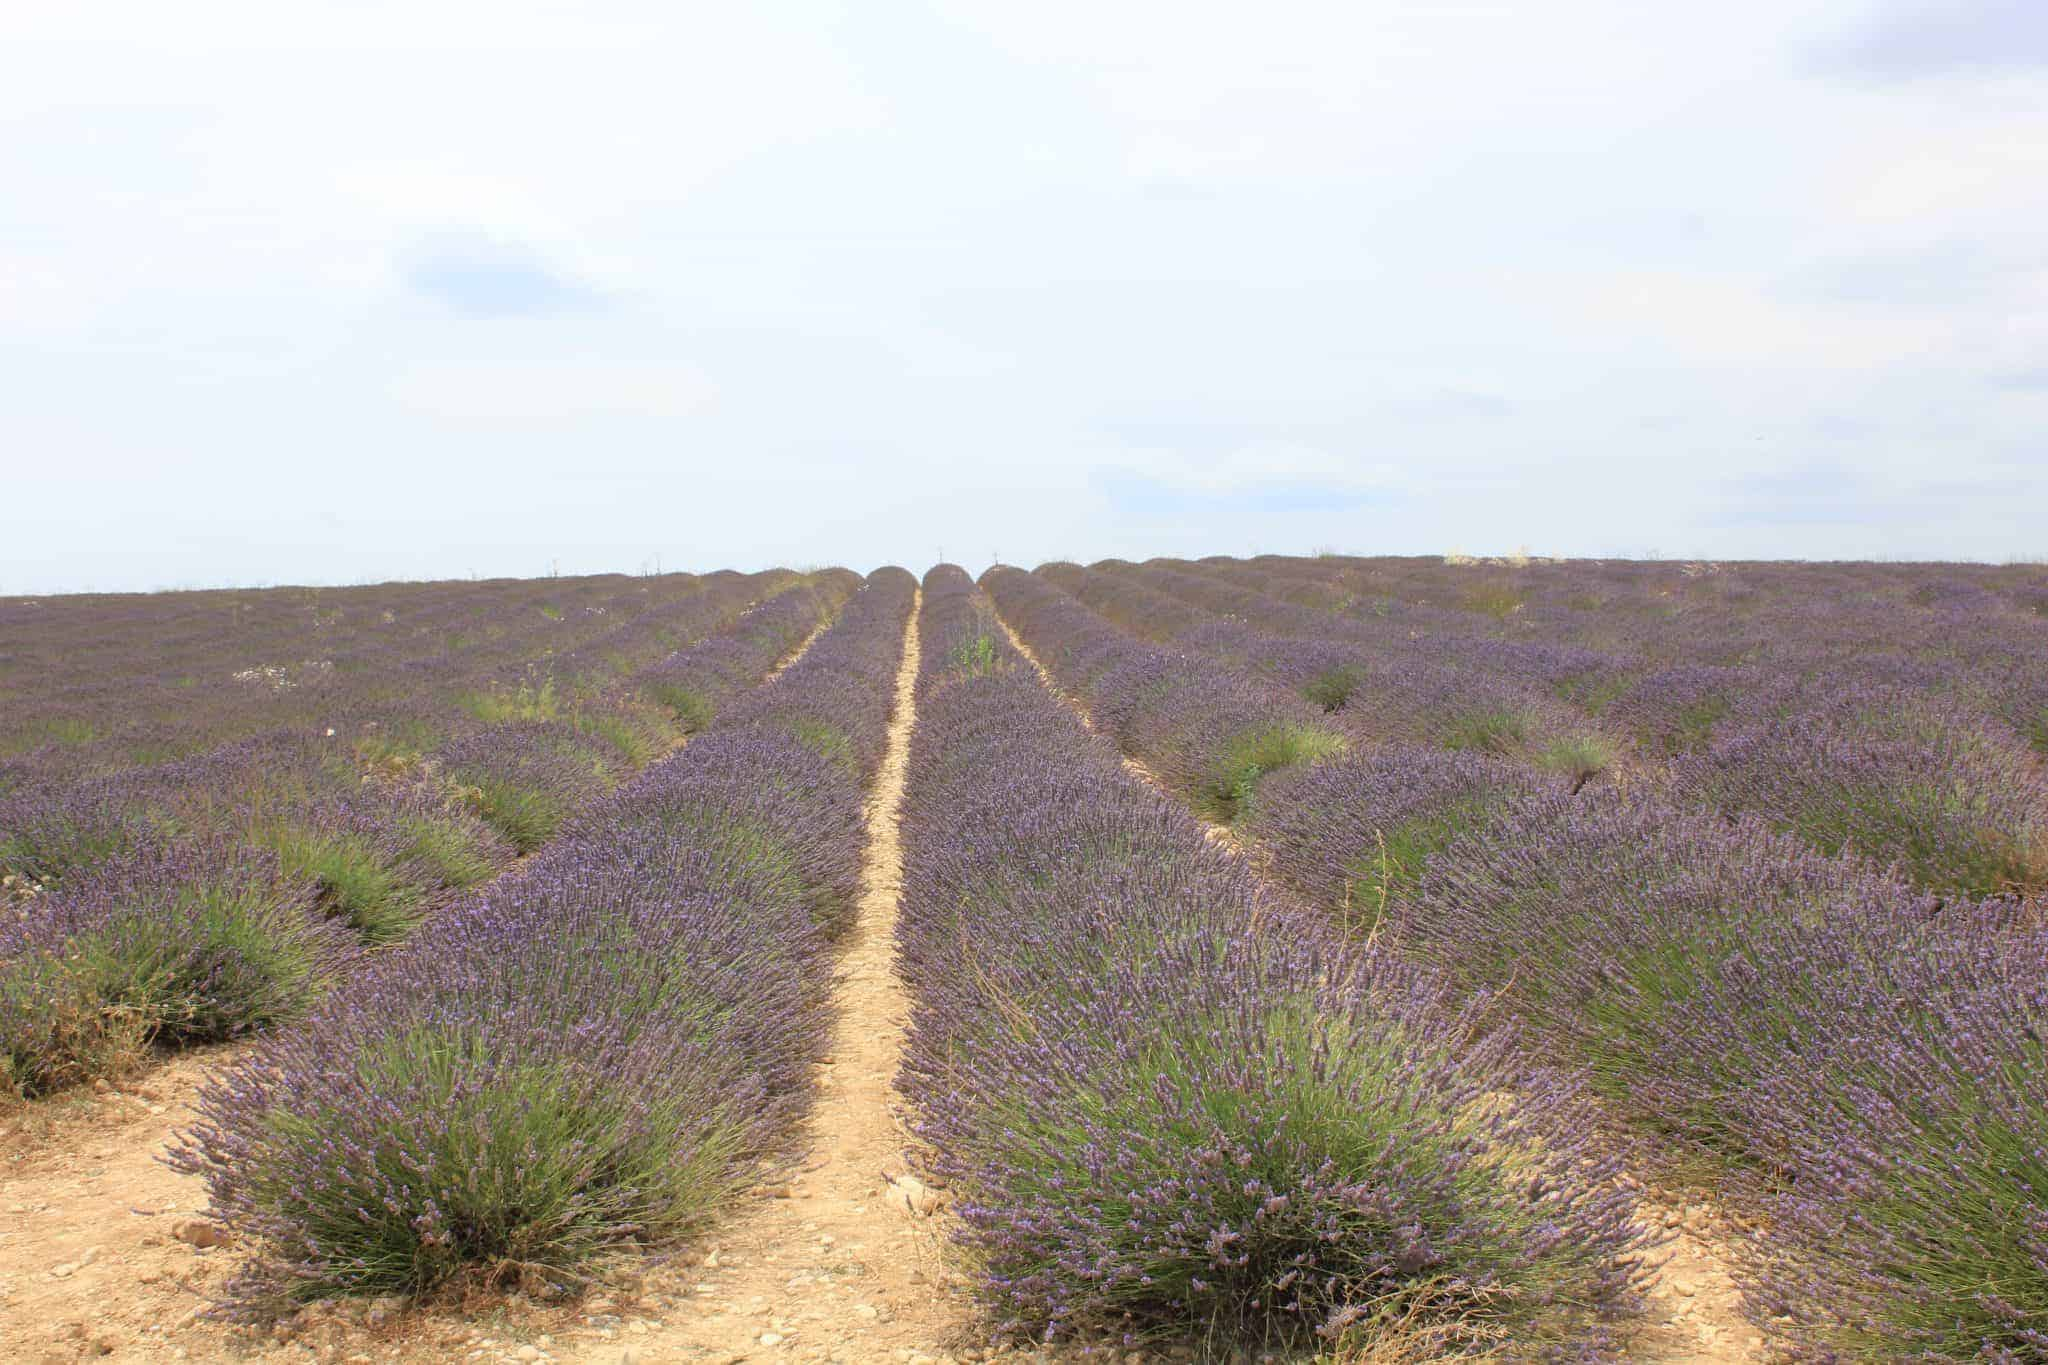 Lavendelåker i Frankrike, norsk reiseblogg, norsk reiseblogger